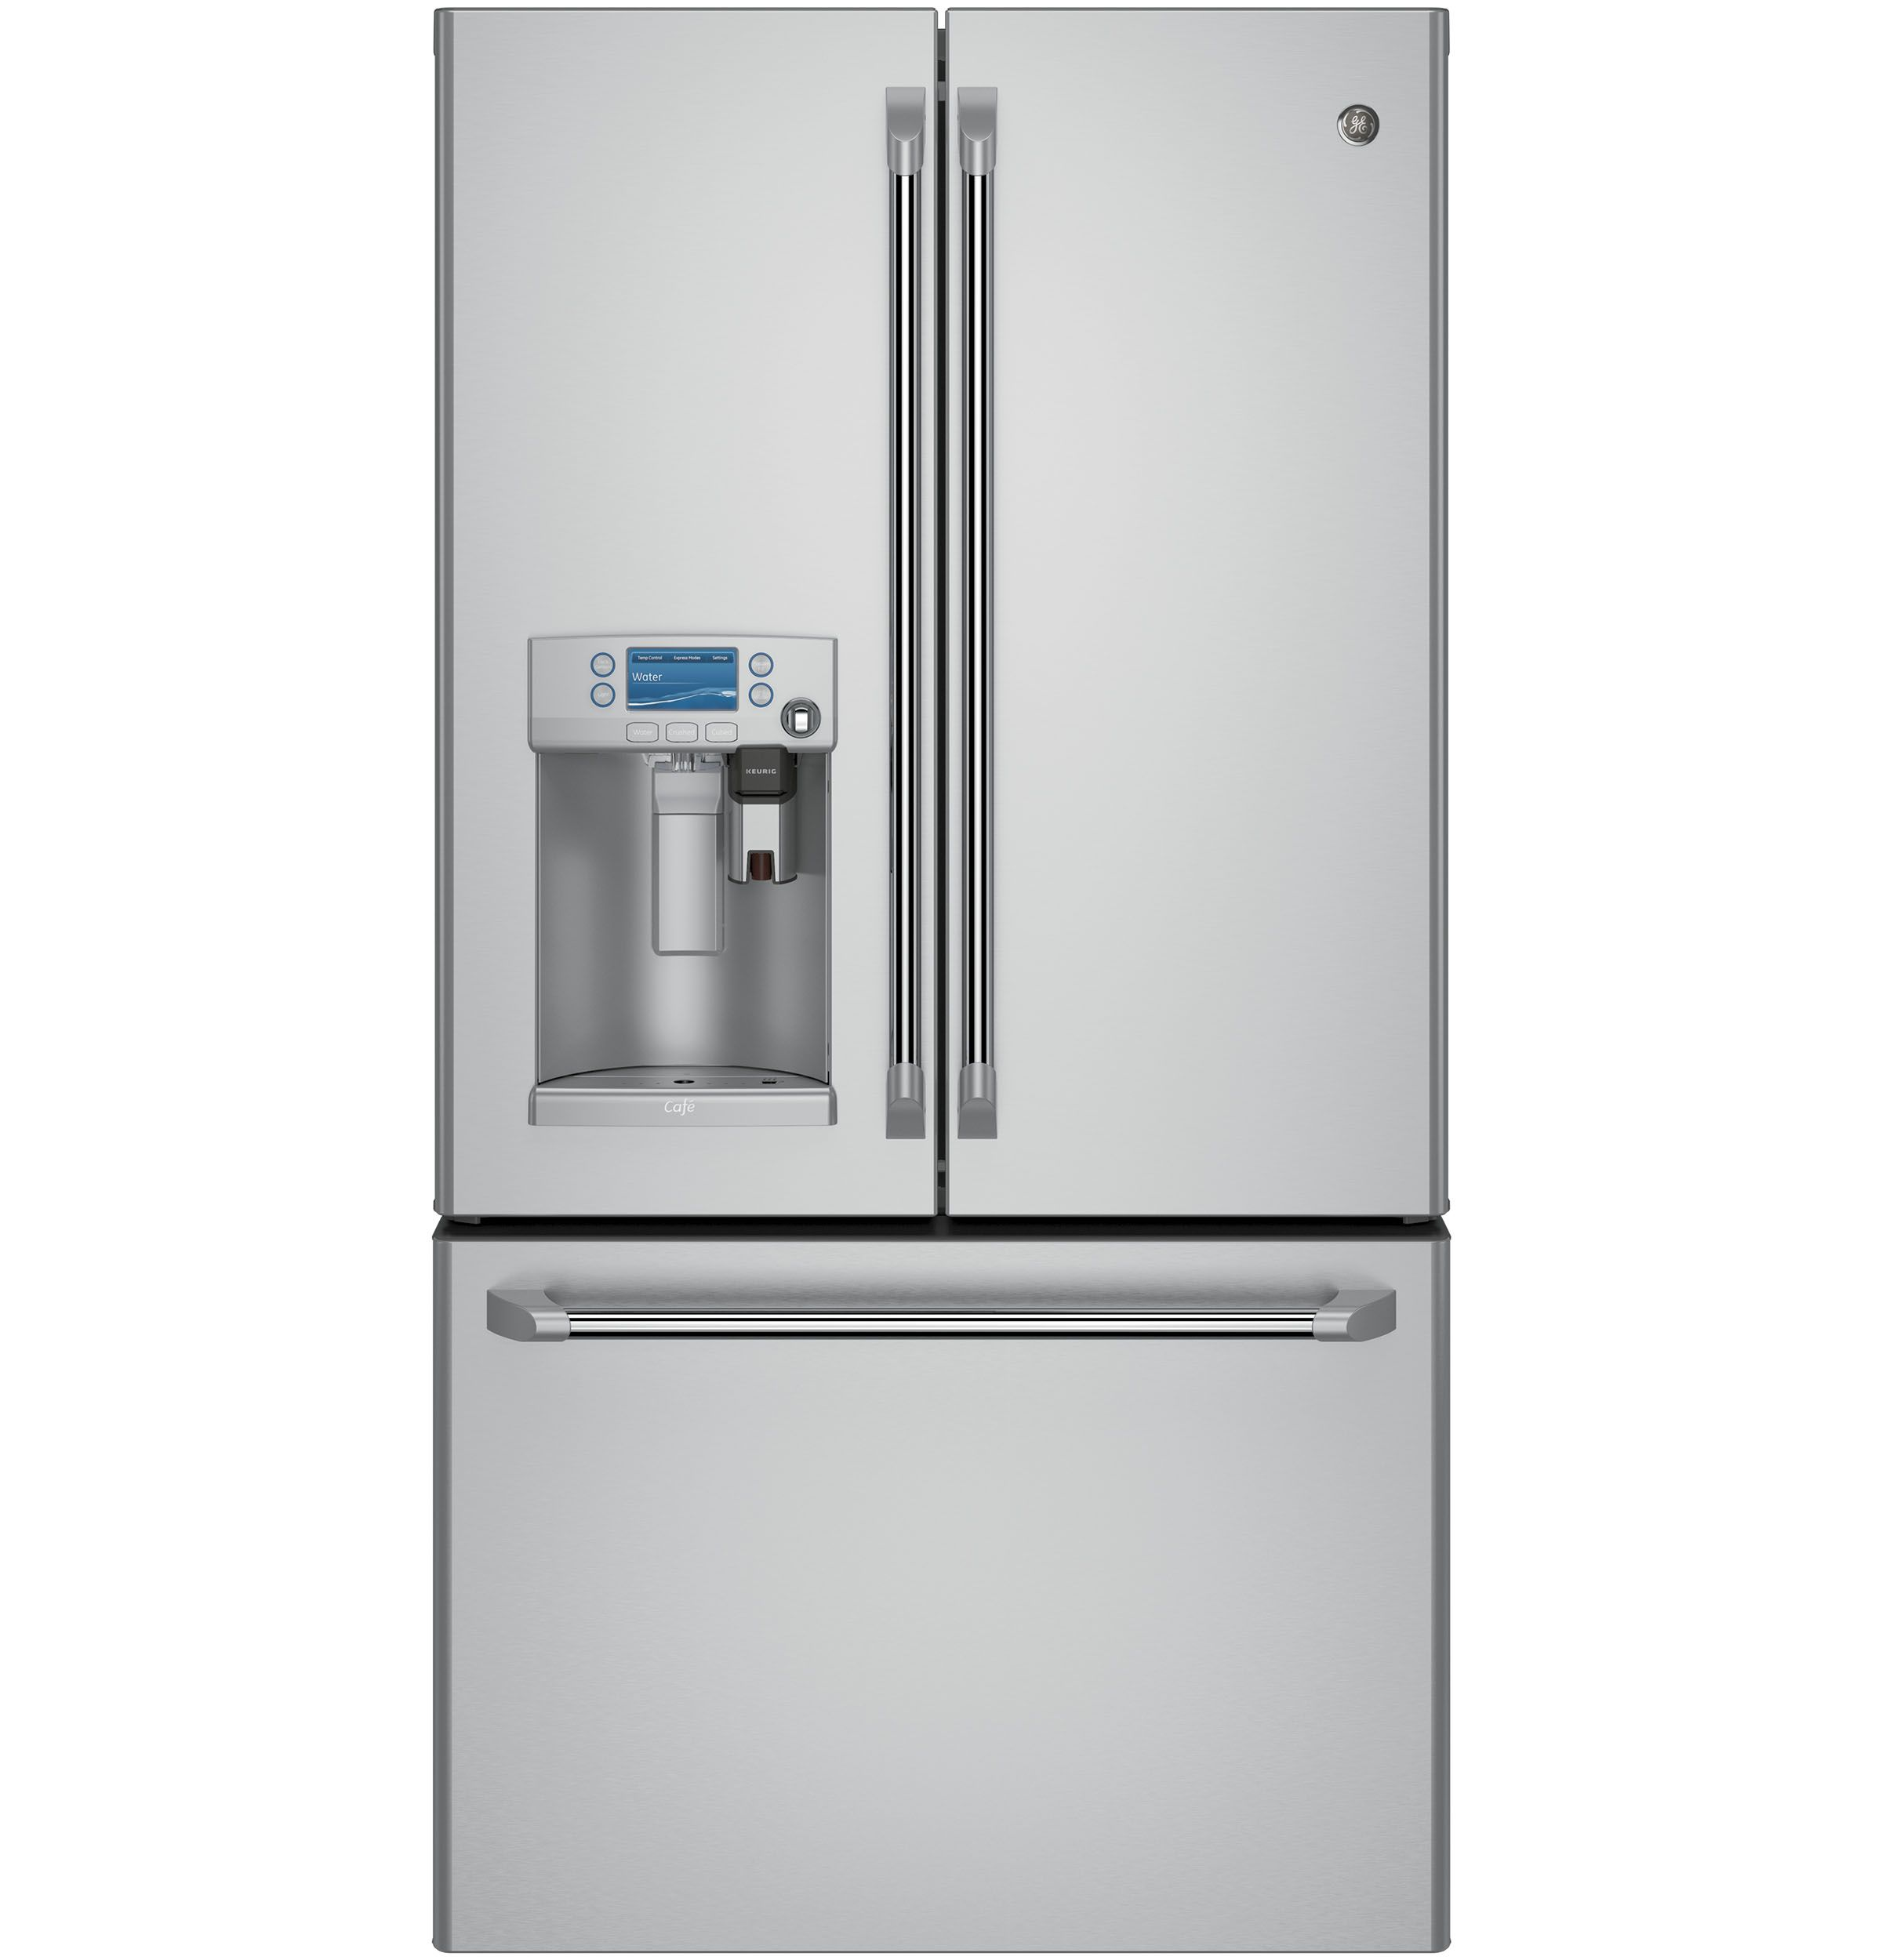 Ge Cye22ushss French Door Refrigerator With Keurig K Cup Brewing